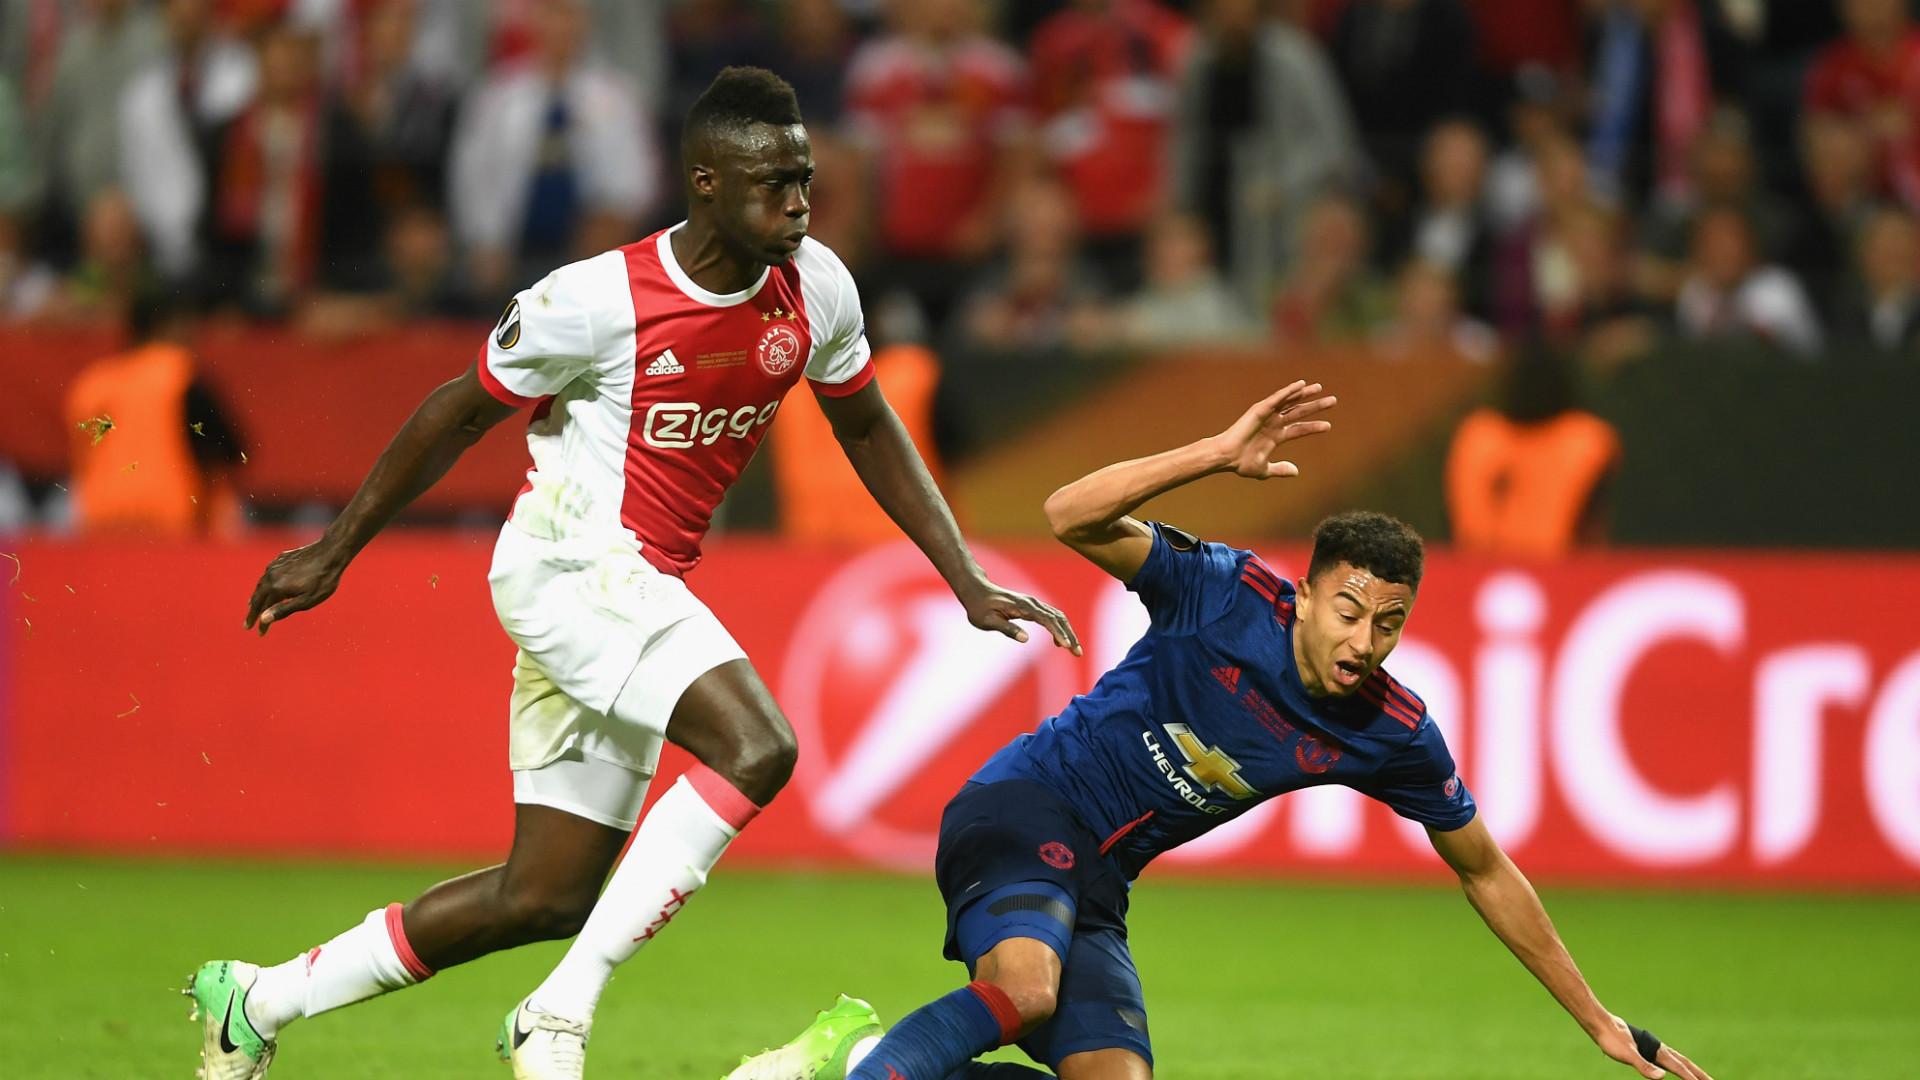 Inter, il ds dell'Ajax avverte: